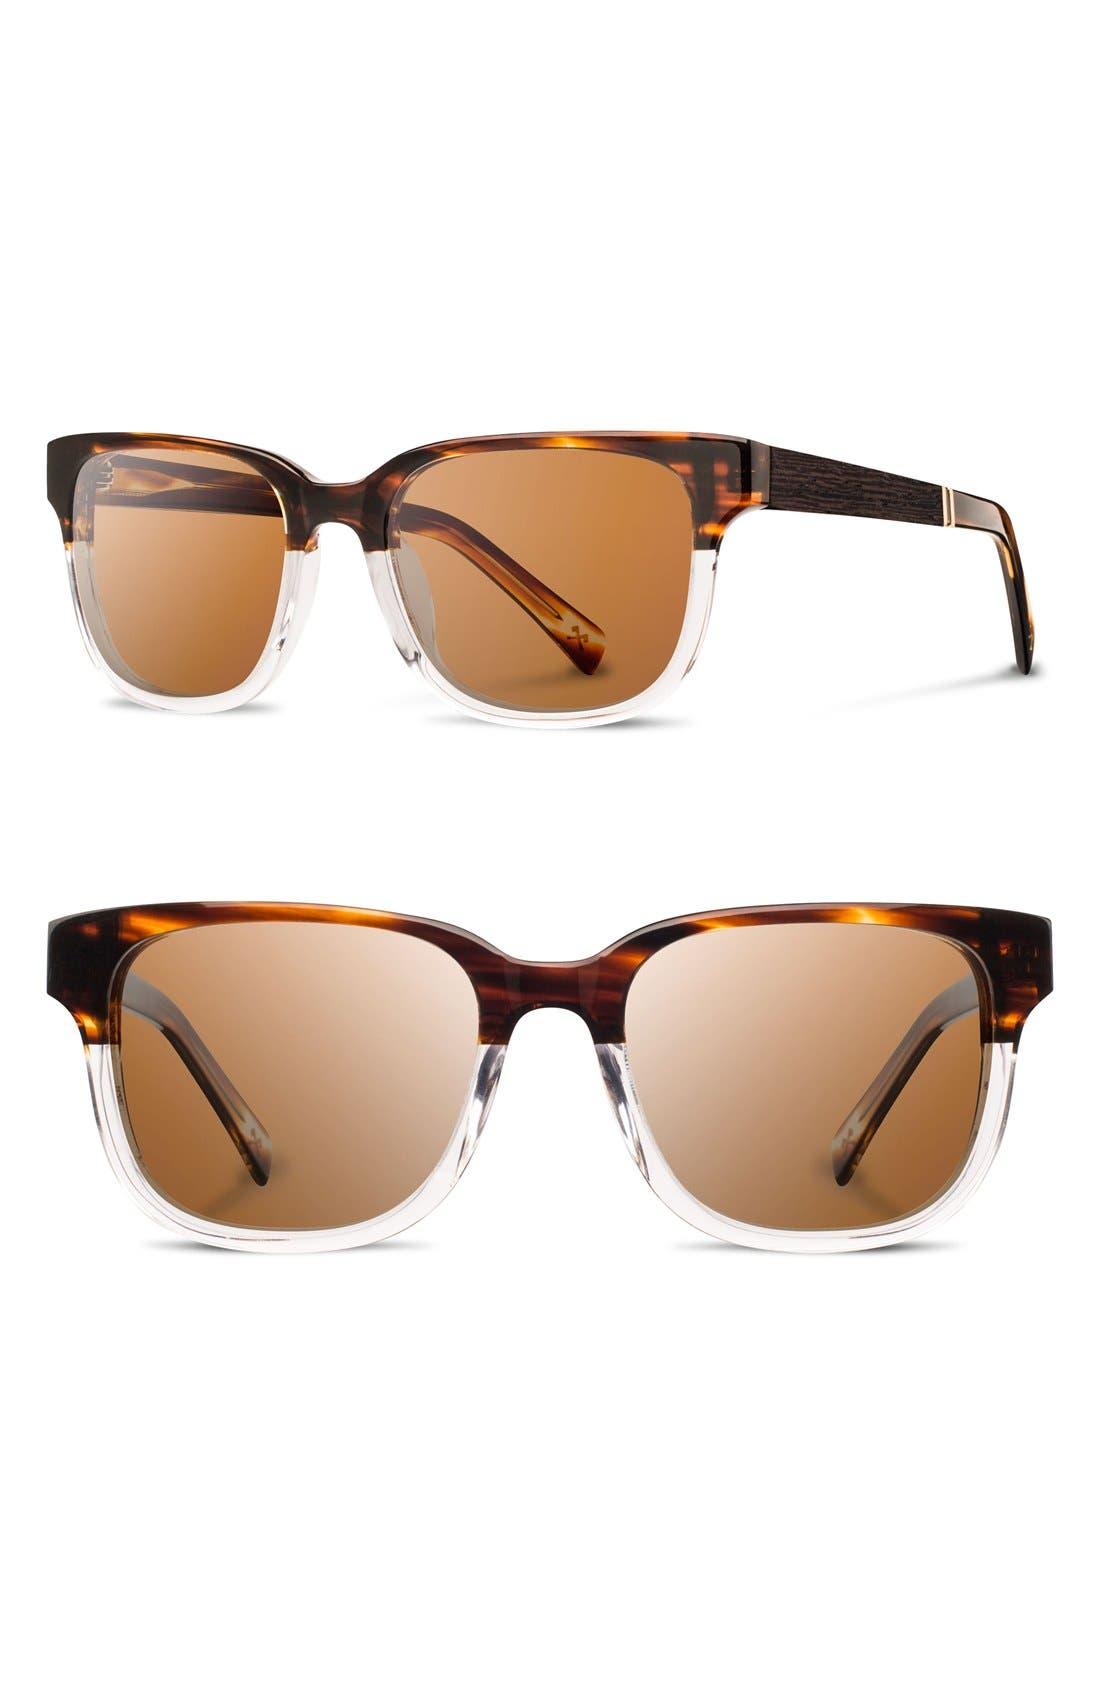 'Prescott' 52mm Acetate & Wood Sunglasses,                             Main thumbnail 1, color,                             222